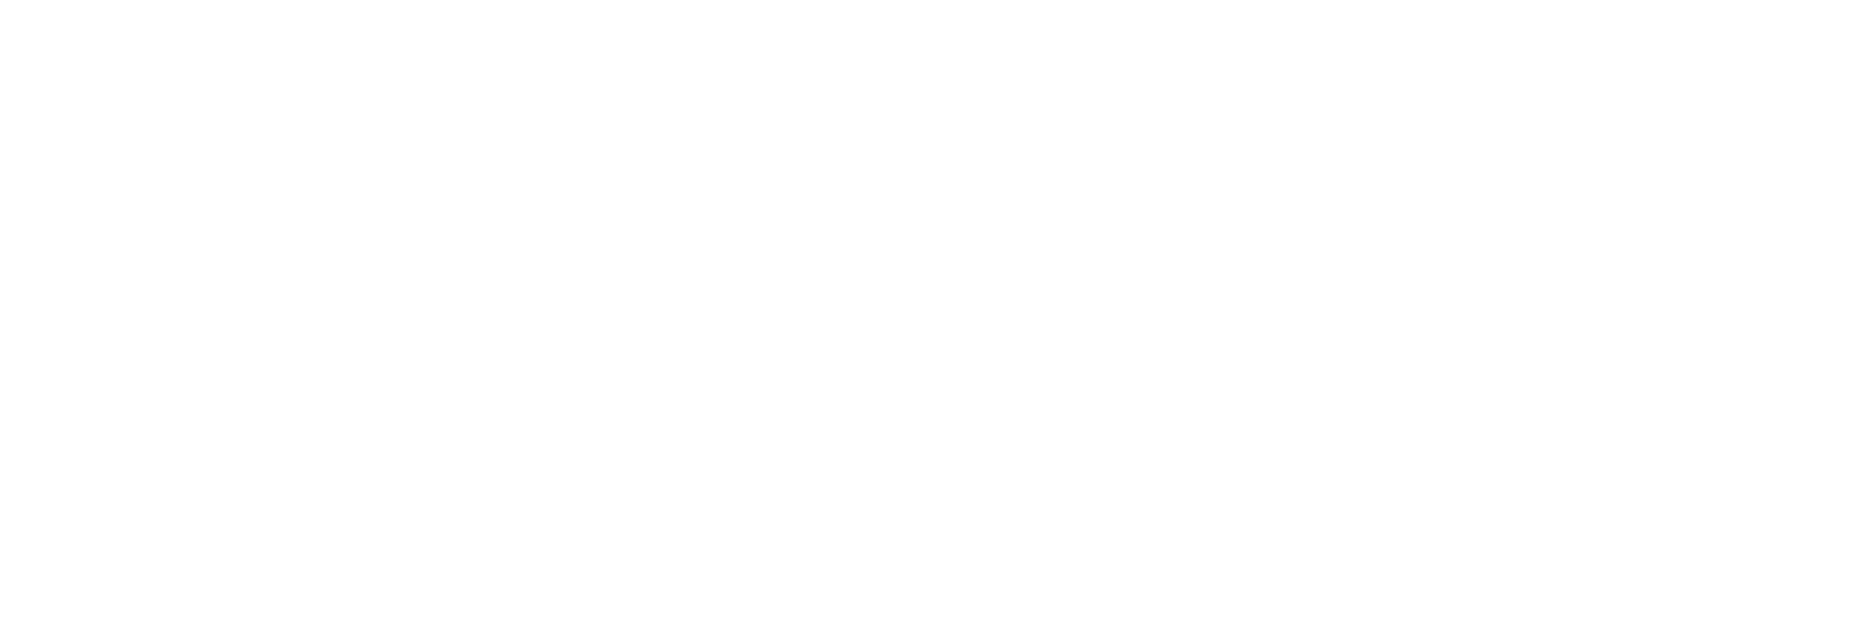 CSCMP